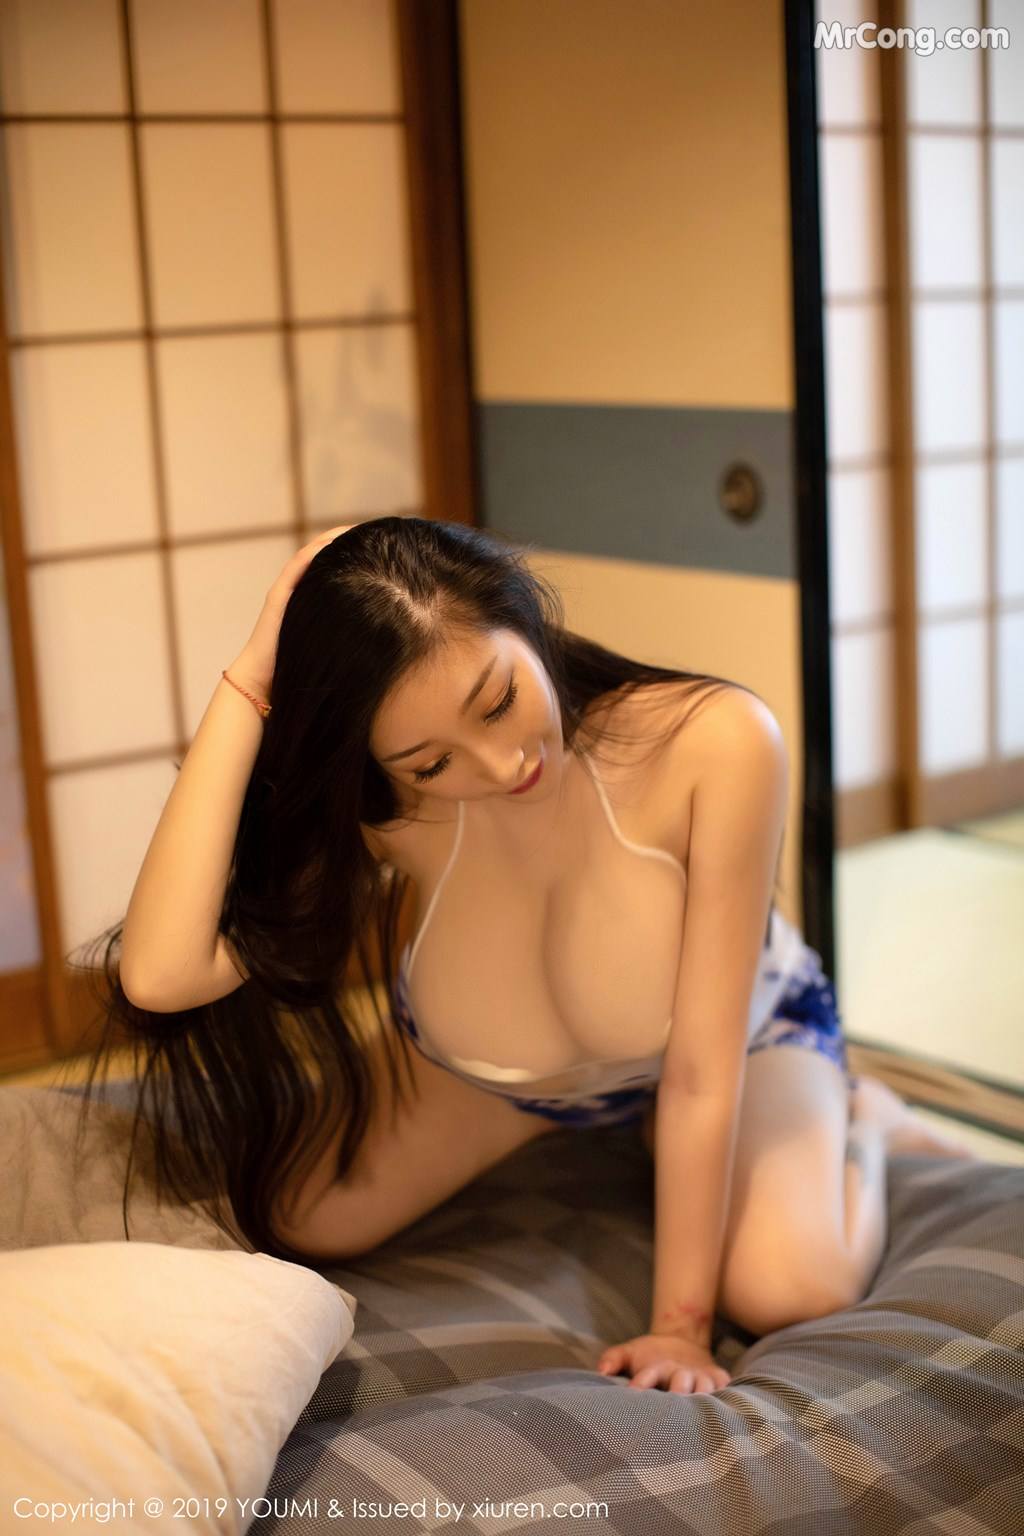 Image YouMi-Vol.294-Daji-Toxic-MrCong.com-005 in post YouMi Vol.294: Daji_Toxic (妲己_Toxic) (45 ảnh)